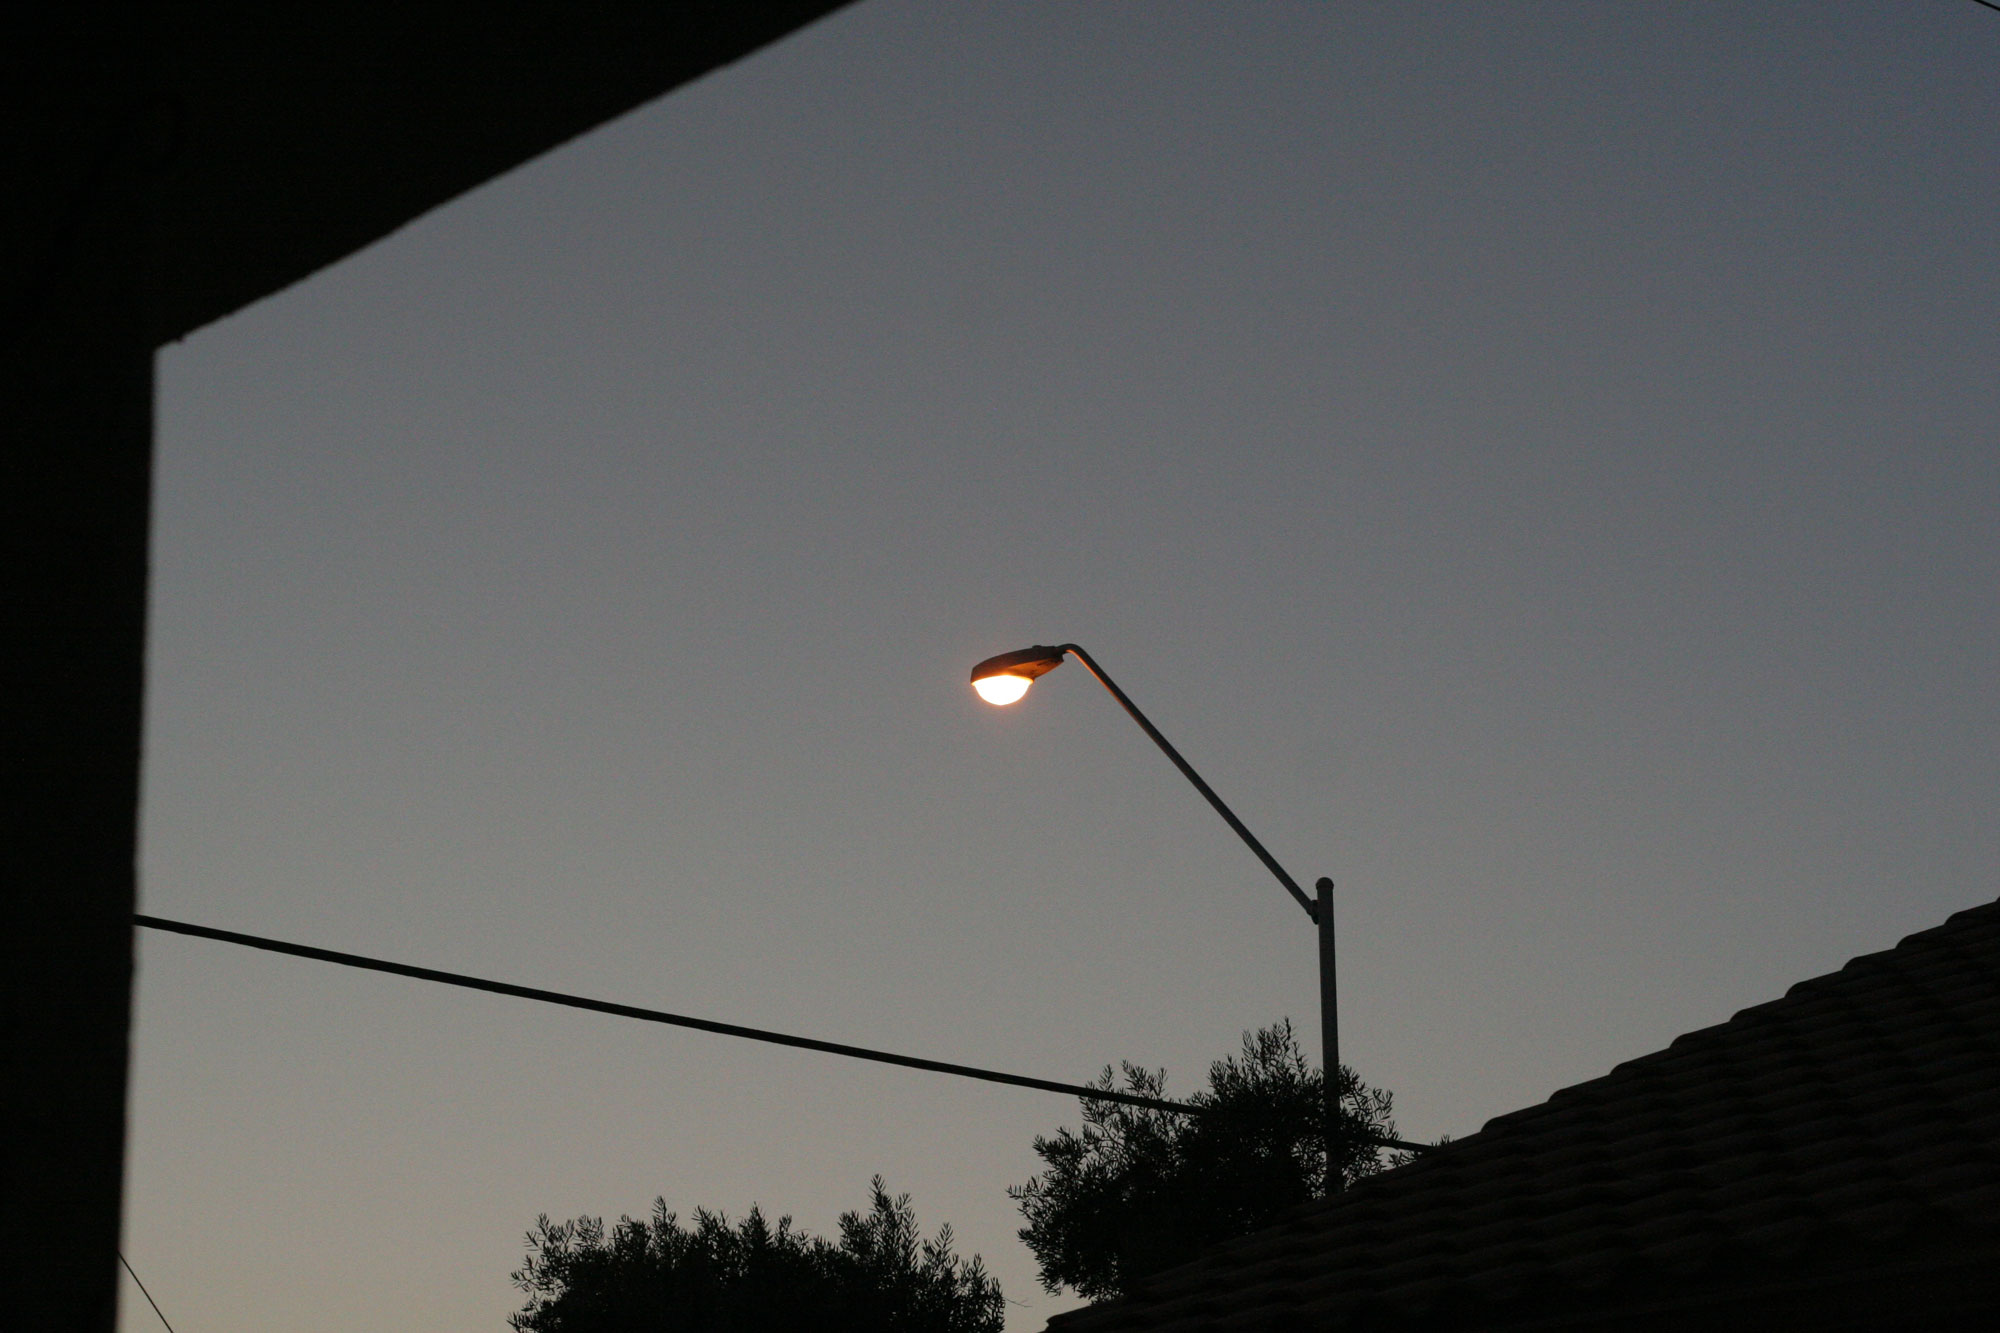 Light pole shot from 50mm lens.